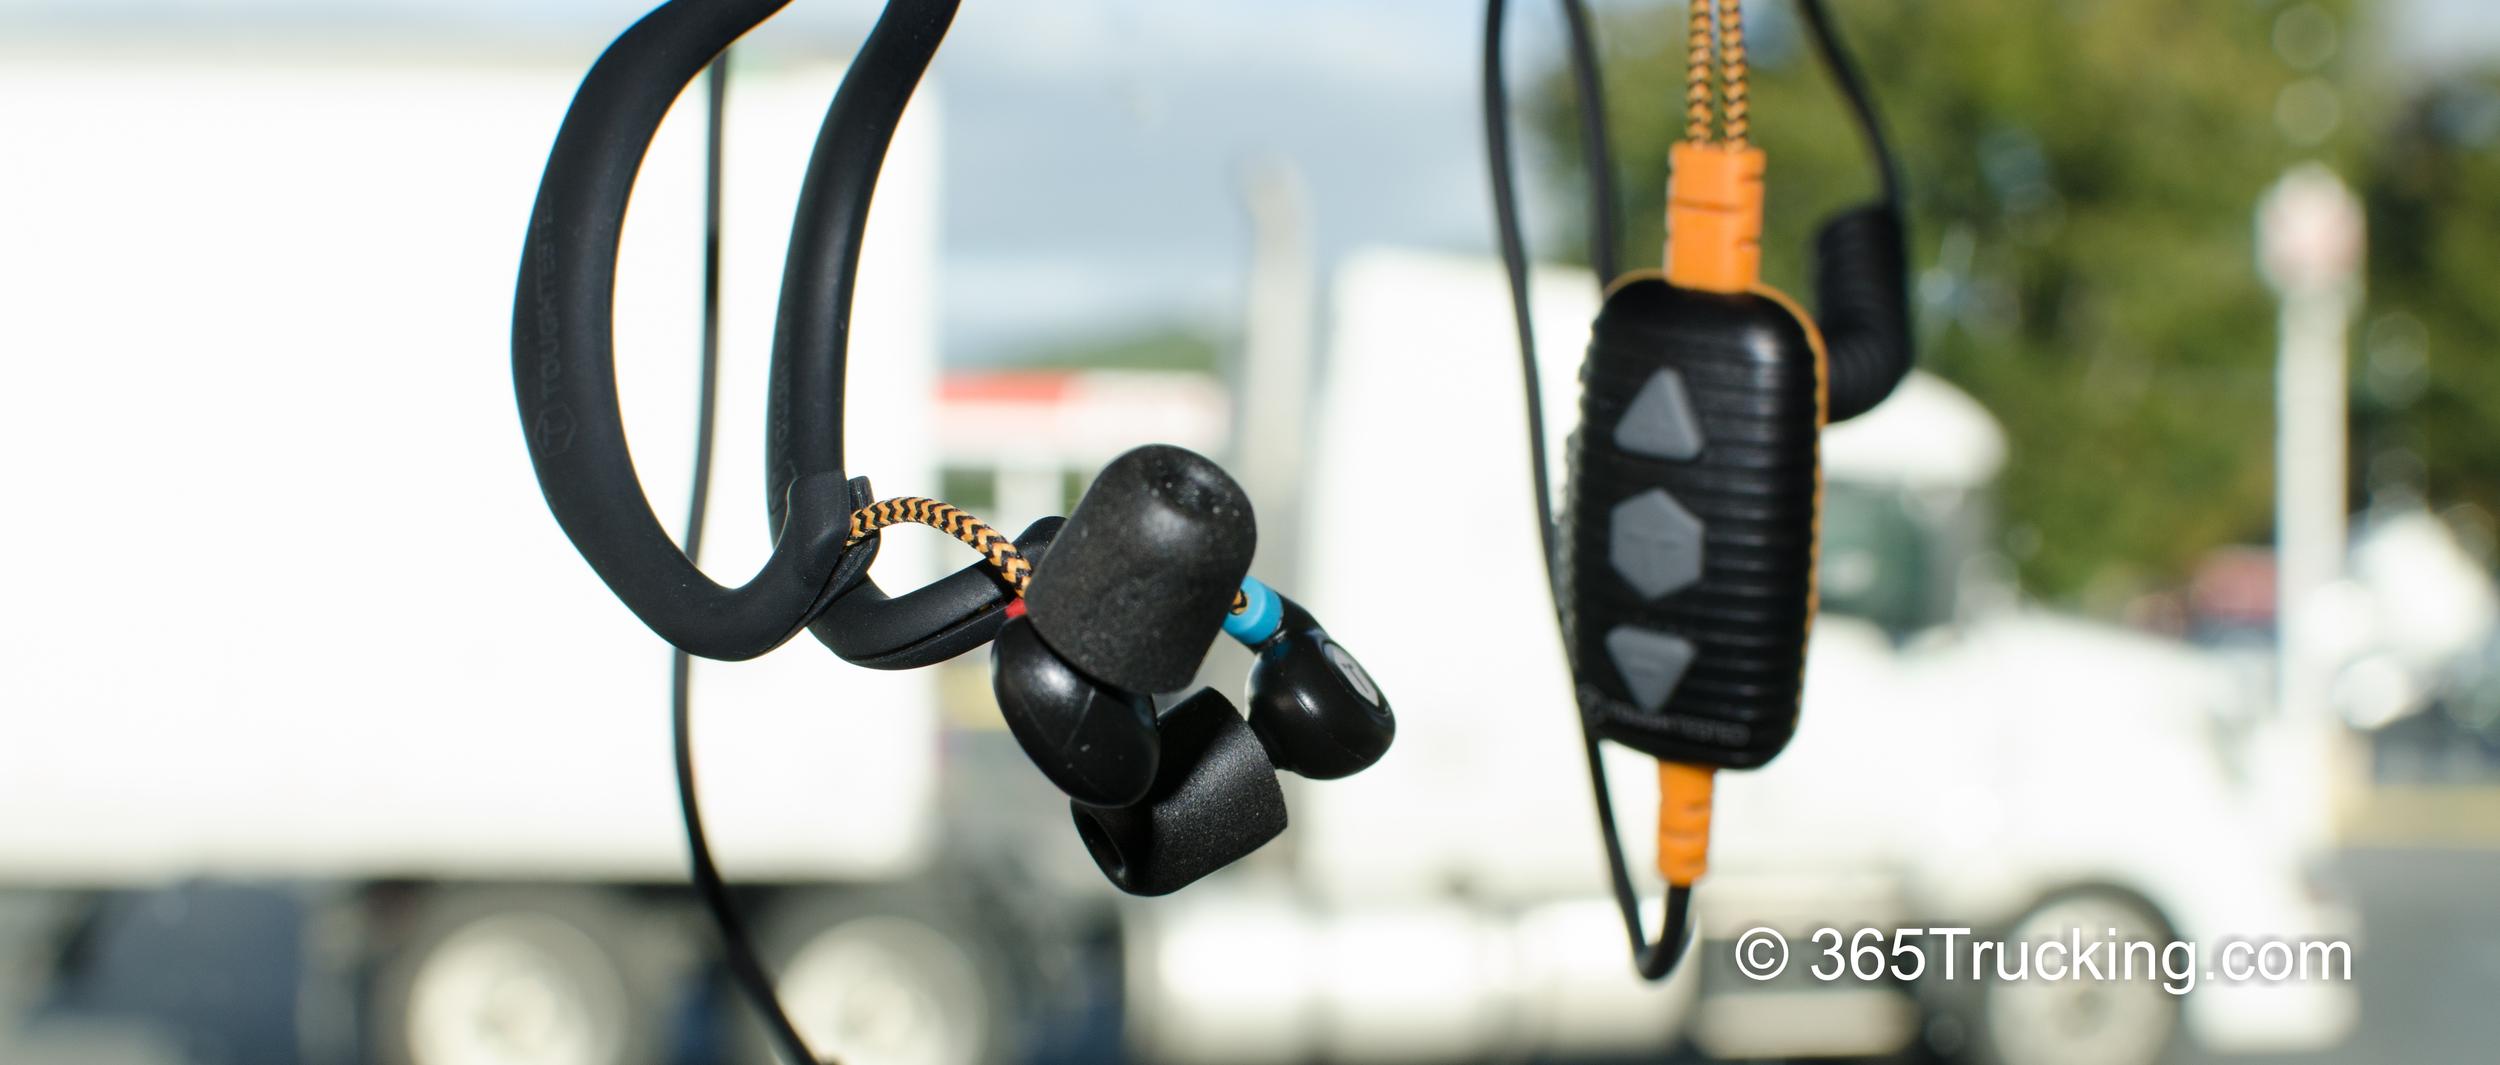 Tough_Tested_Headphones_100515-21.jpg